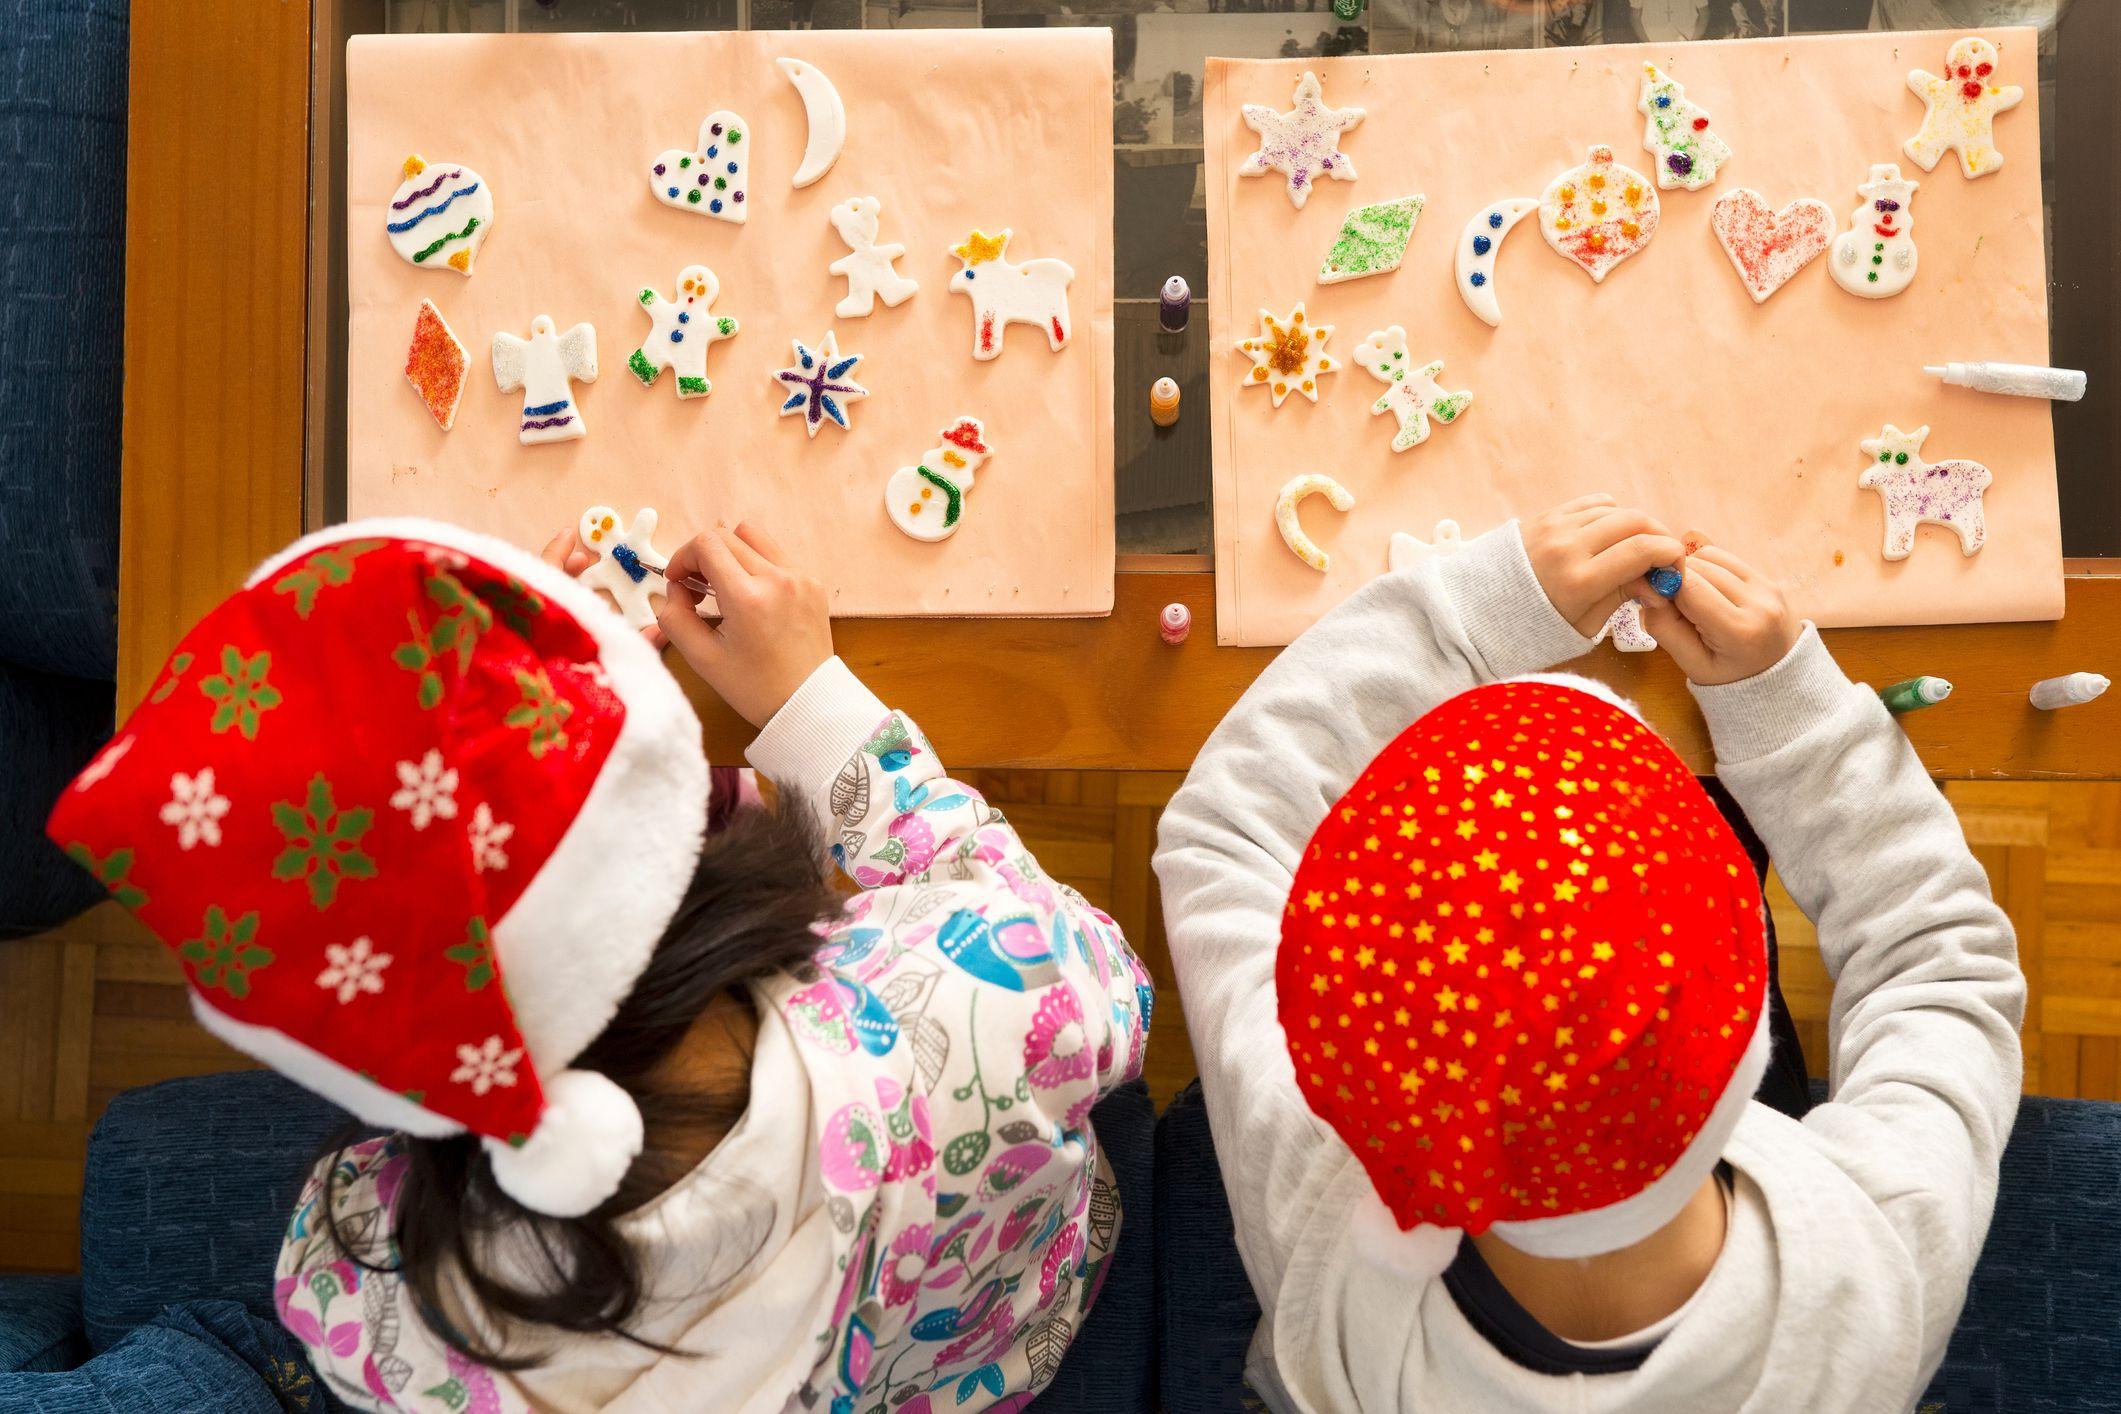 9 Festive Kids Christmas Party Ideas